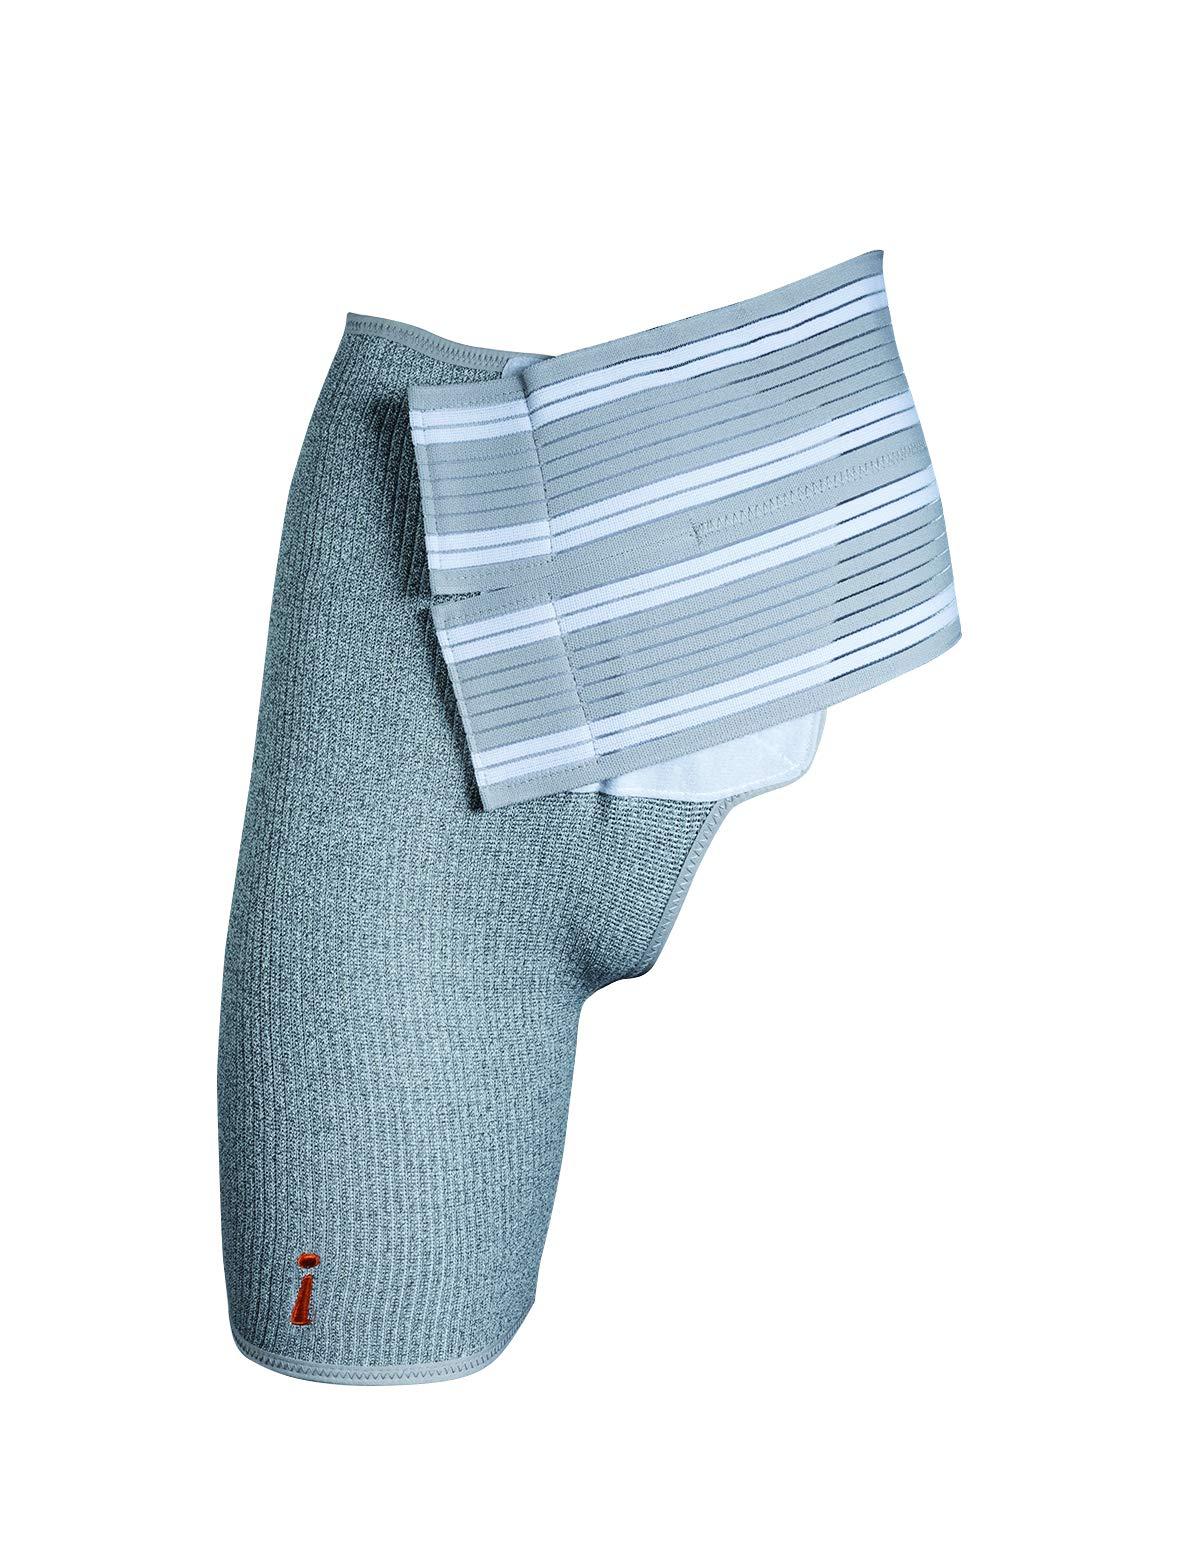 INCREDIWEAR Right Hip Brace, Grey, Small, 0.03 Pound